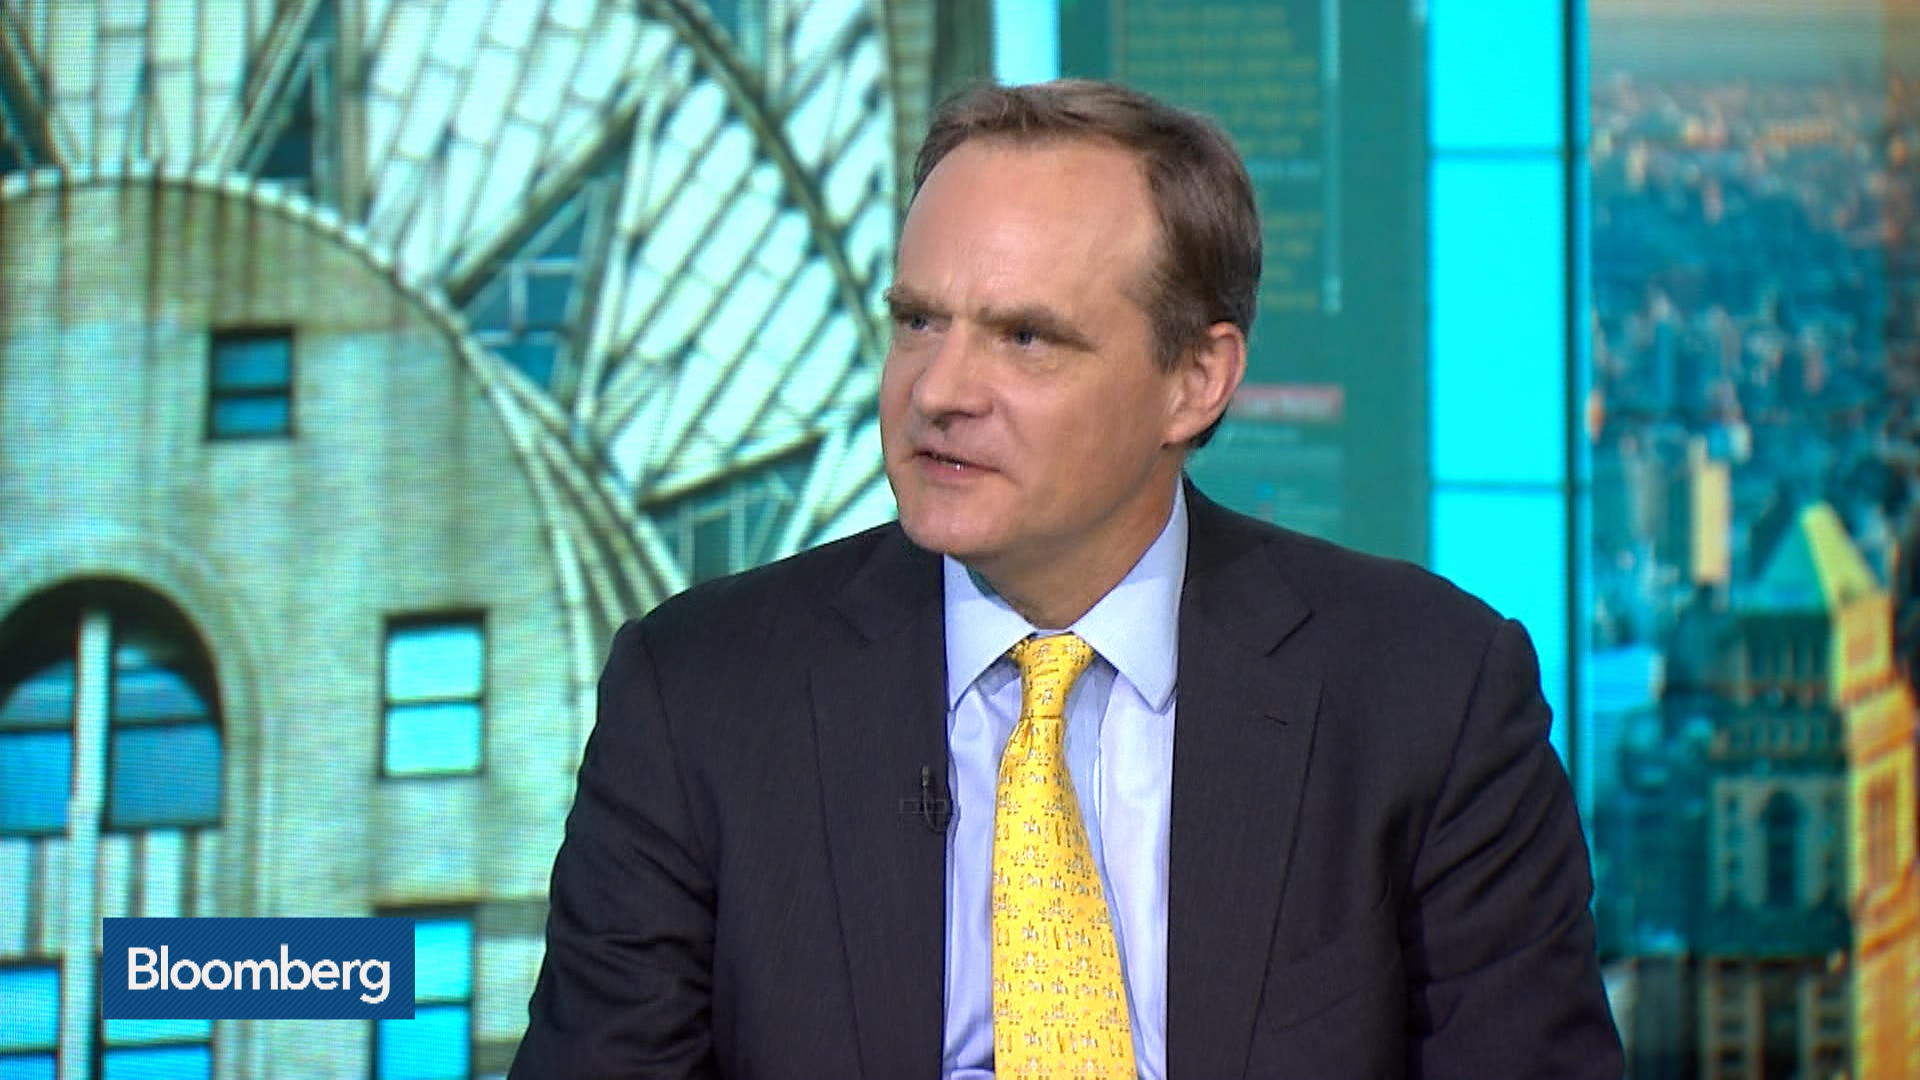 U.S. in Danger of Doing Financial Crisis Again, MIT's Johnson Warns